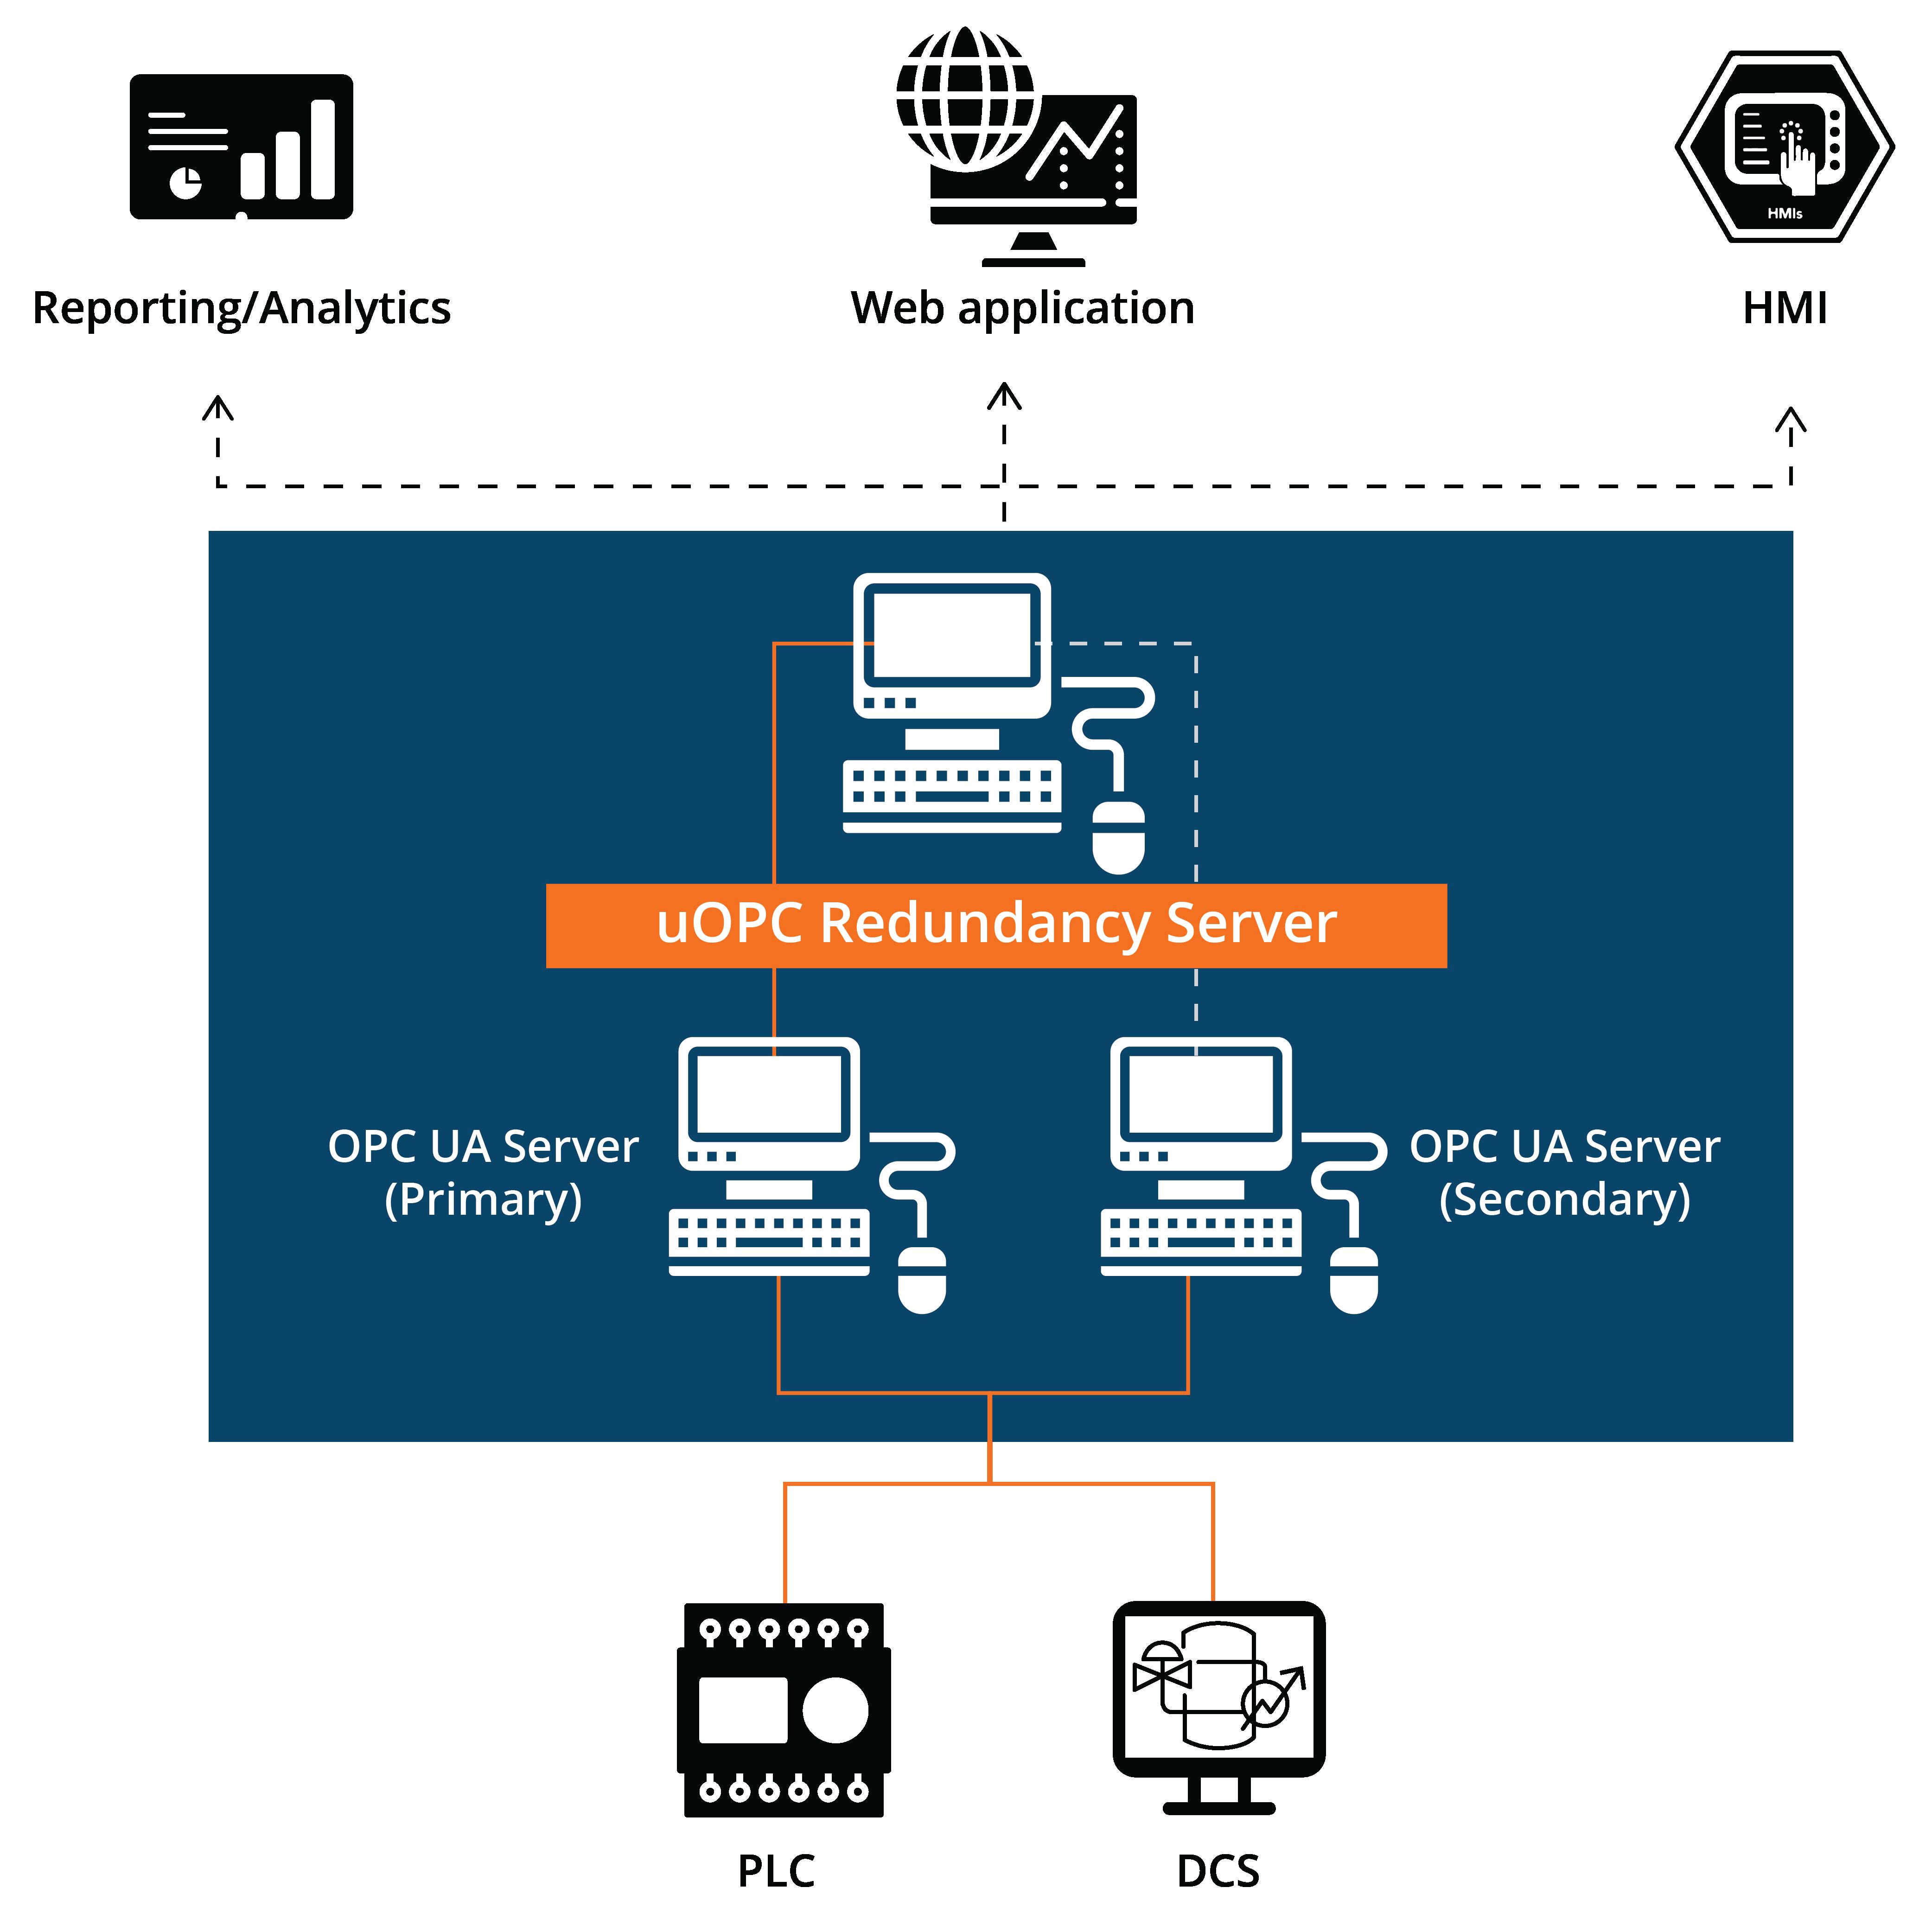 uOPC Redundancy Server